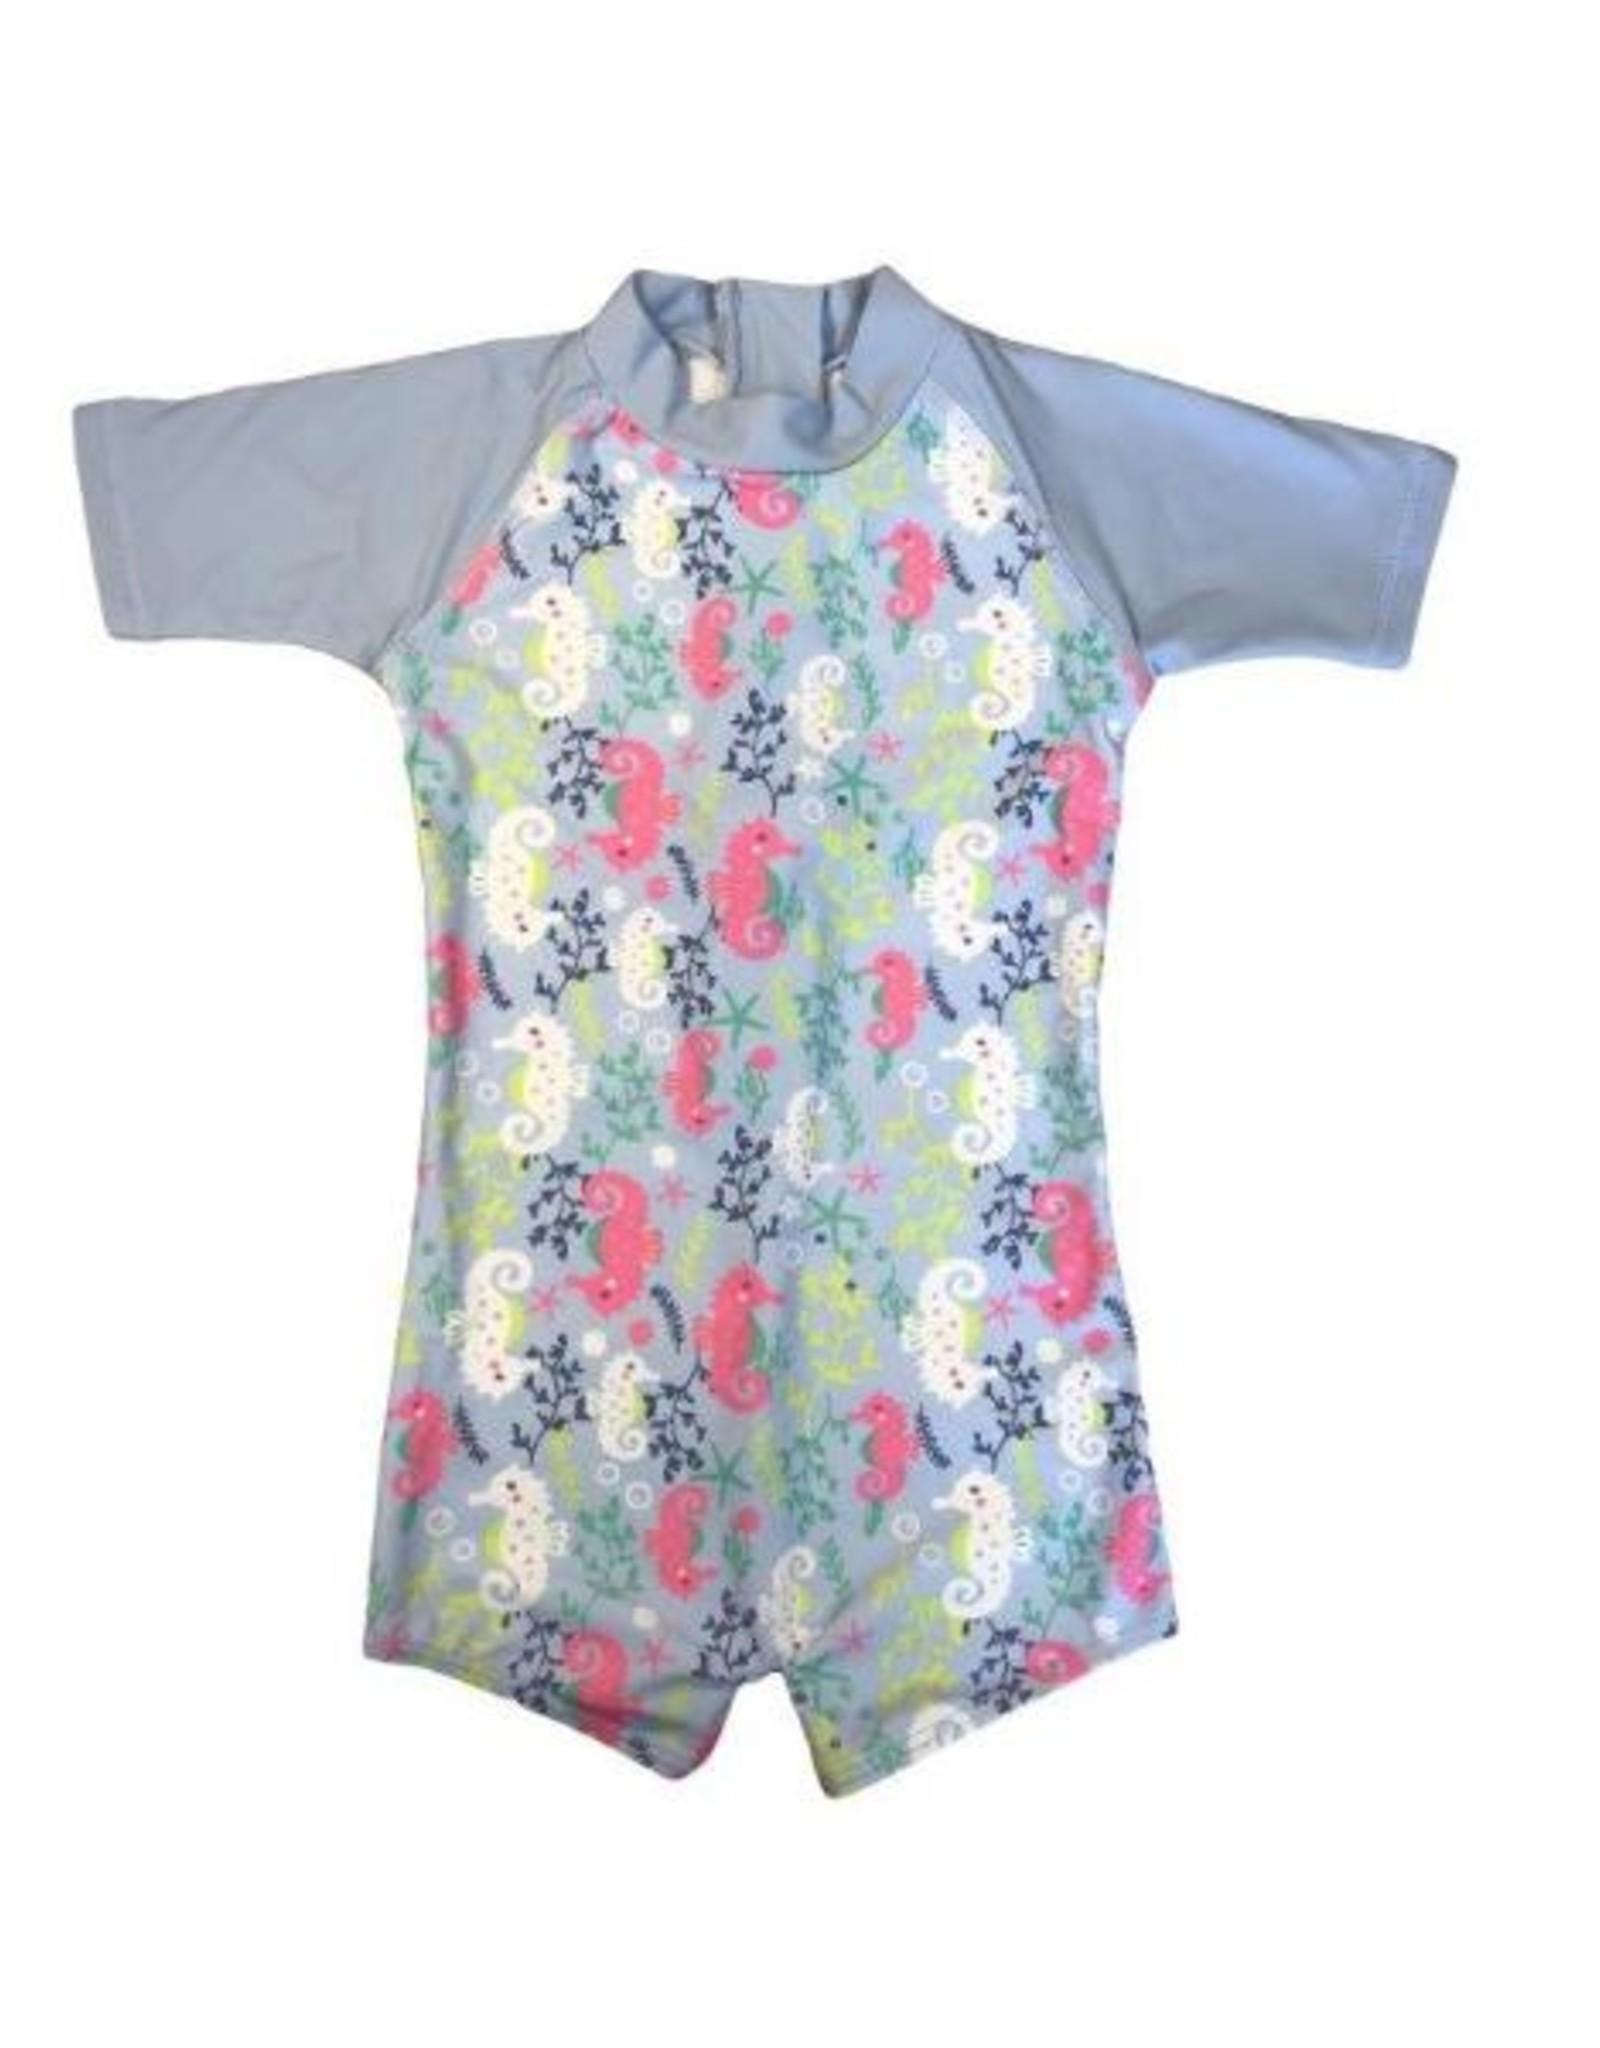 Banz Seahorse Swimsuit